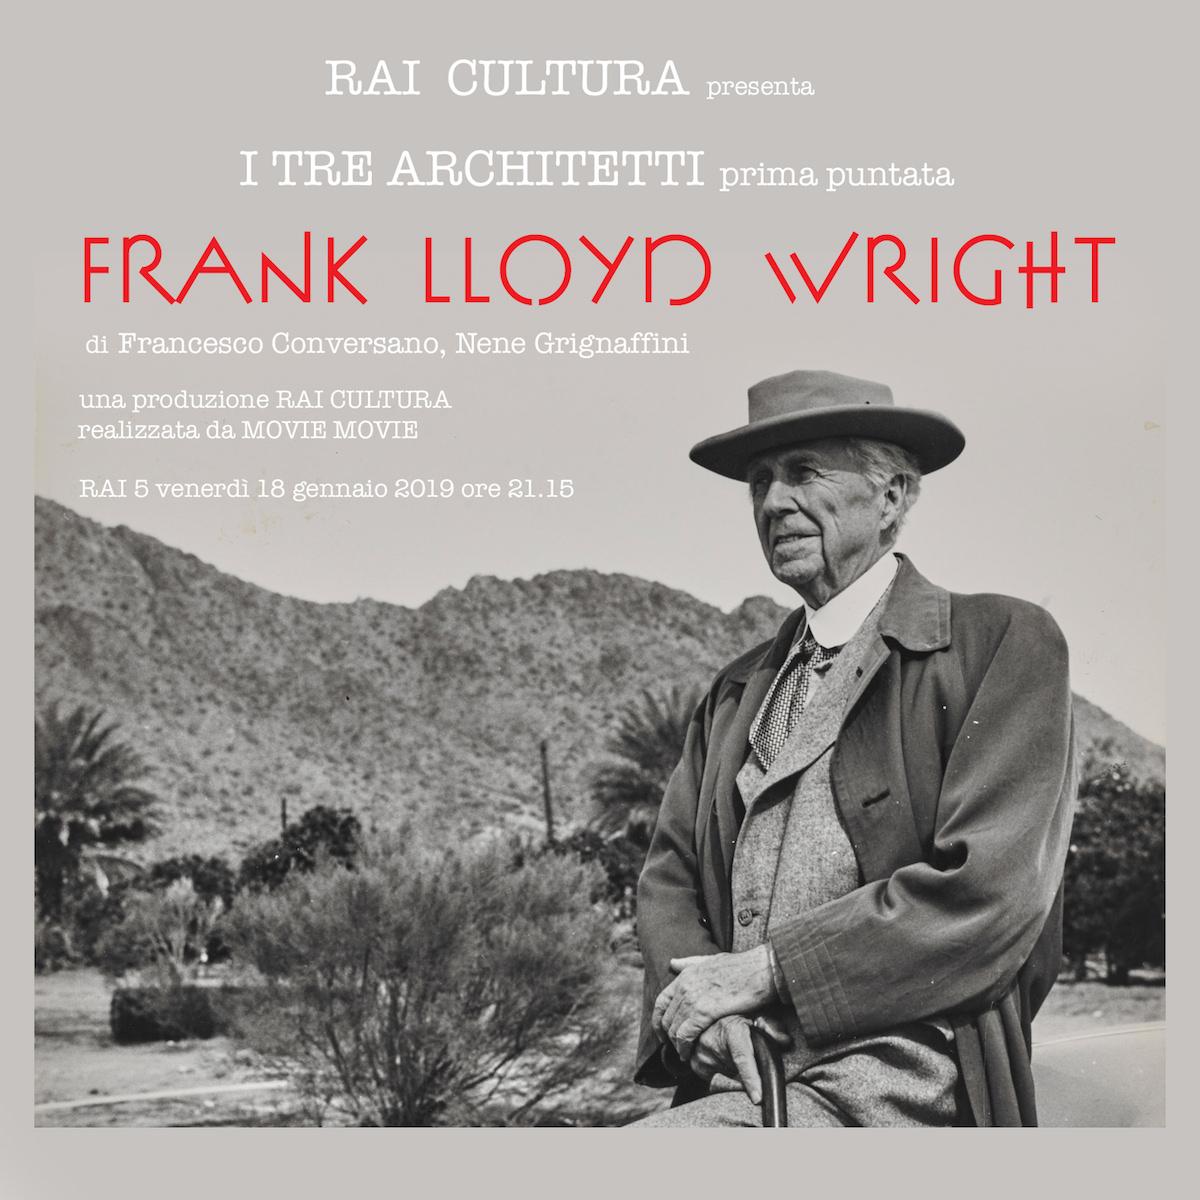 FRANK LLOYD WRIGHT_locandina